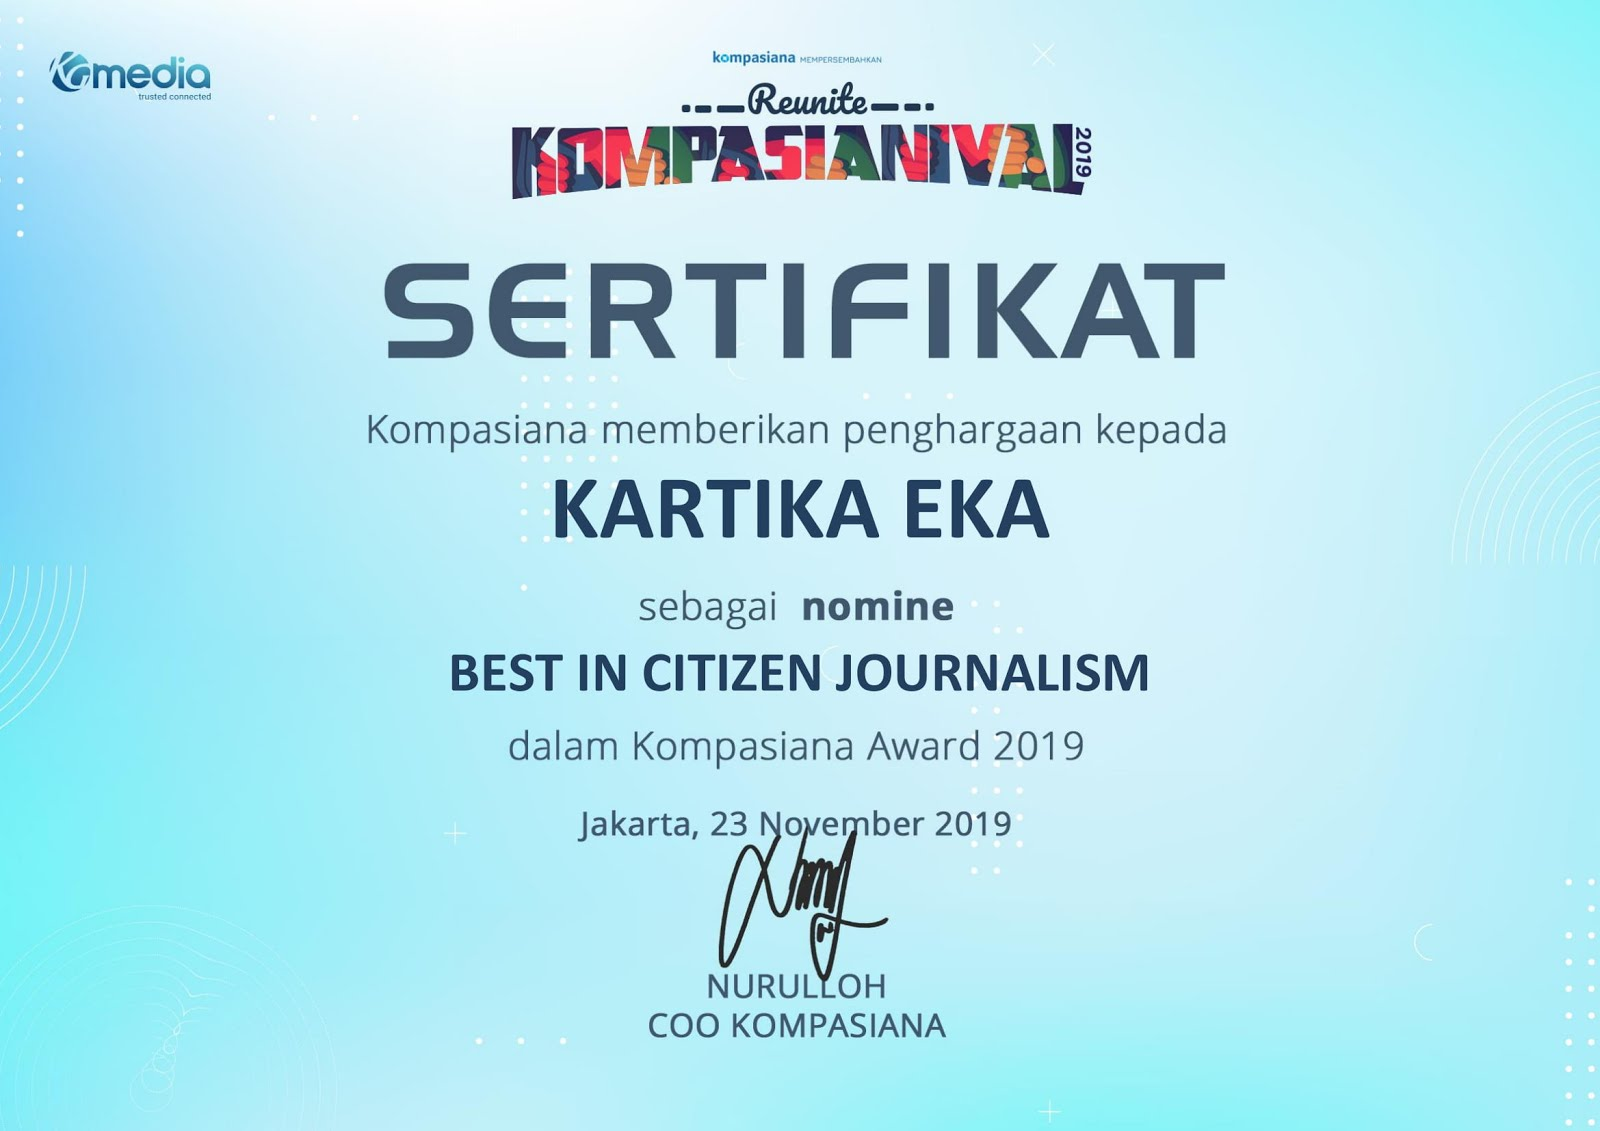 d'best citizen journalism nominee